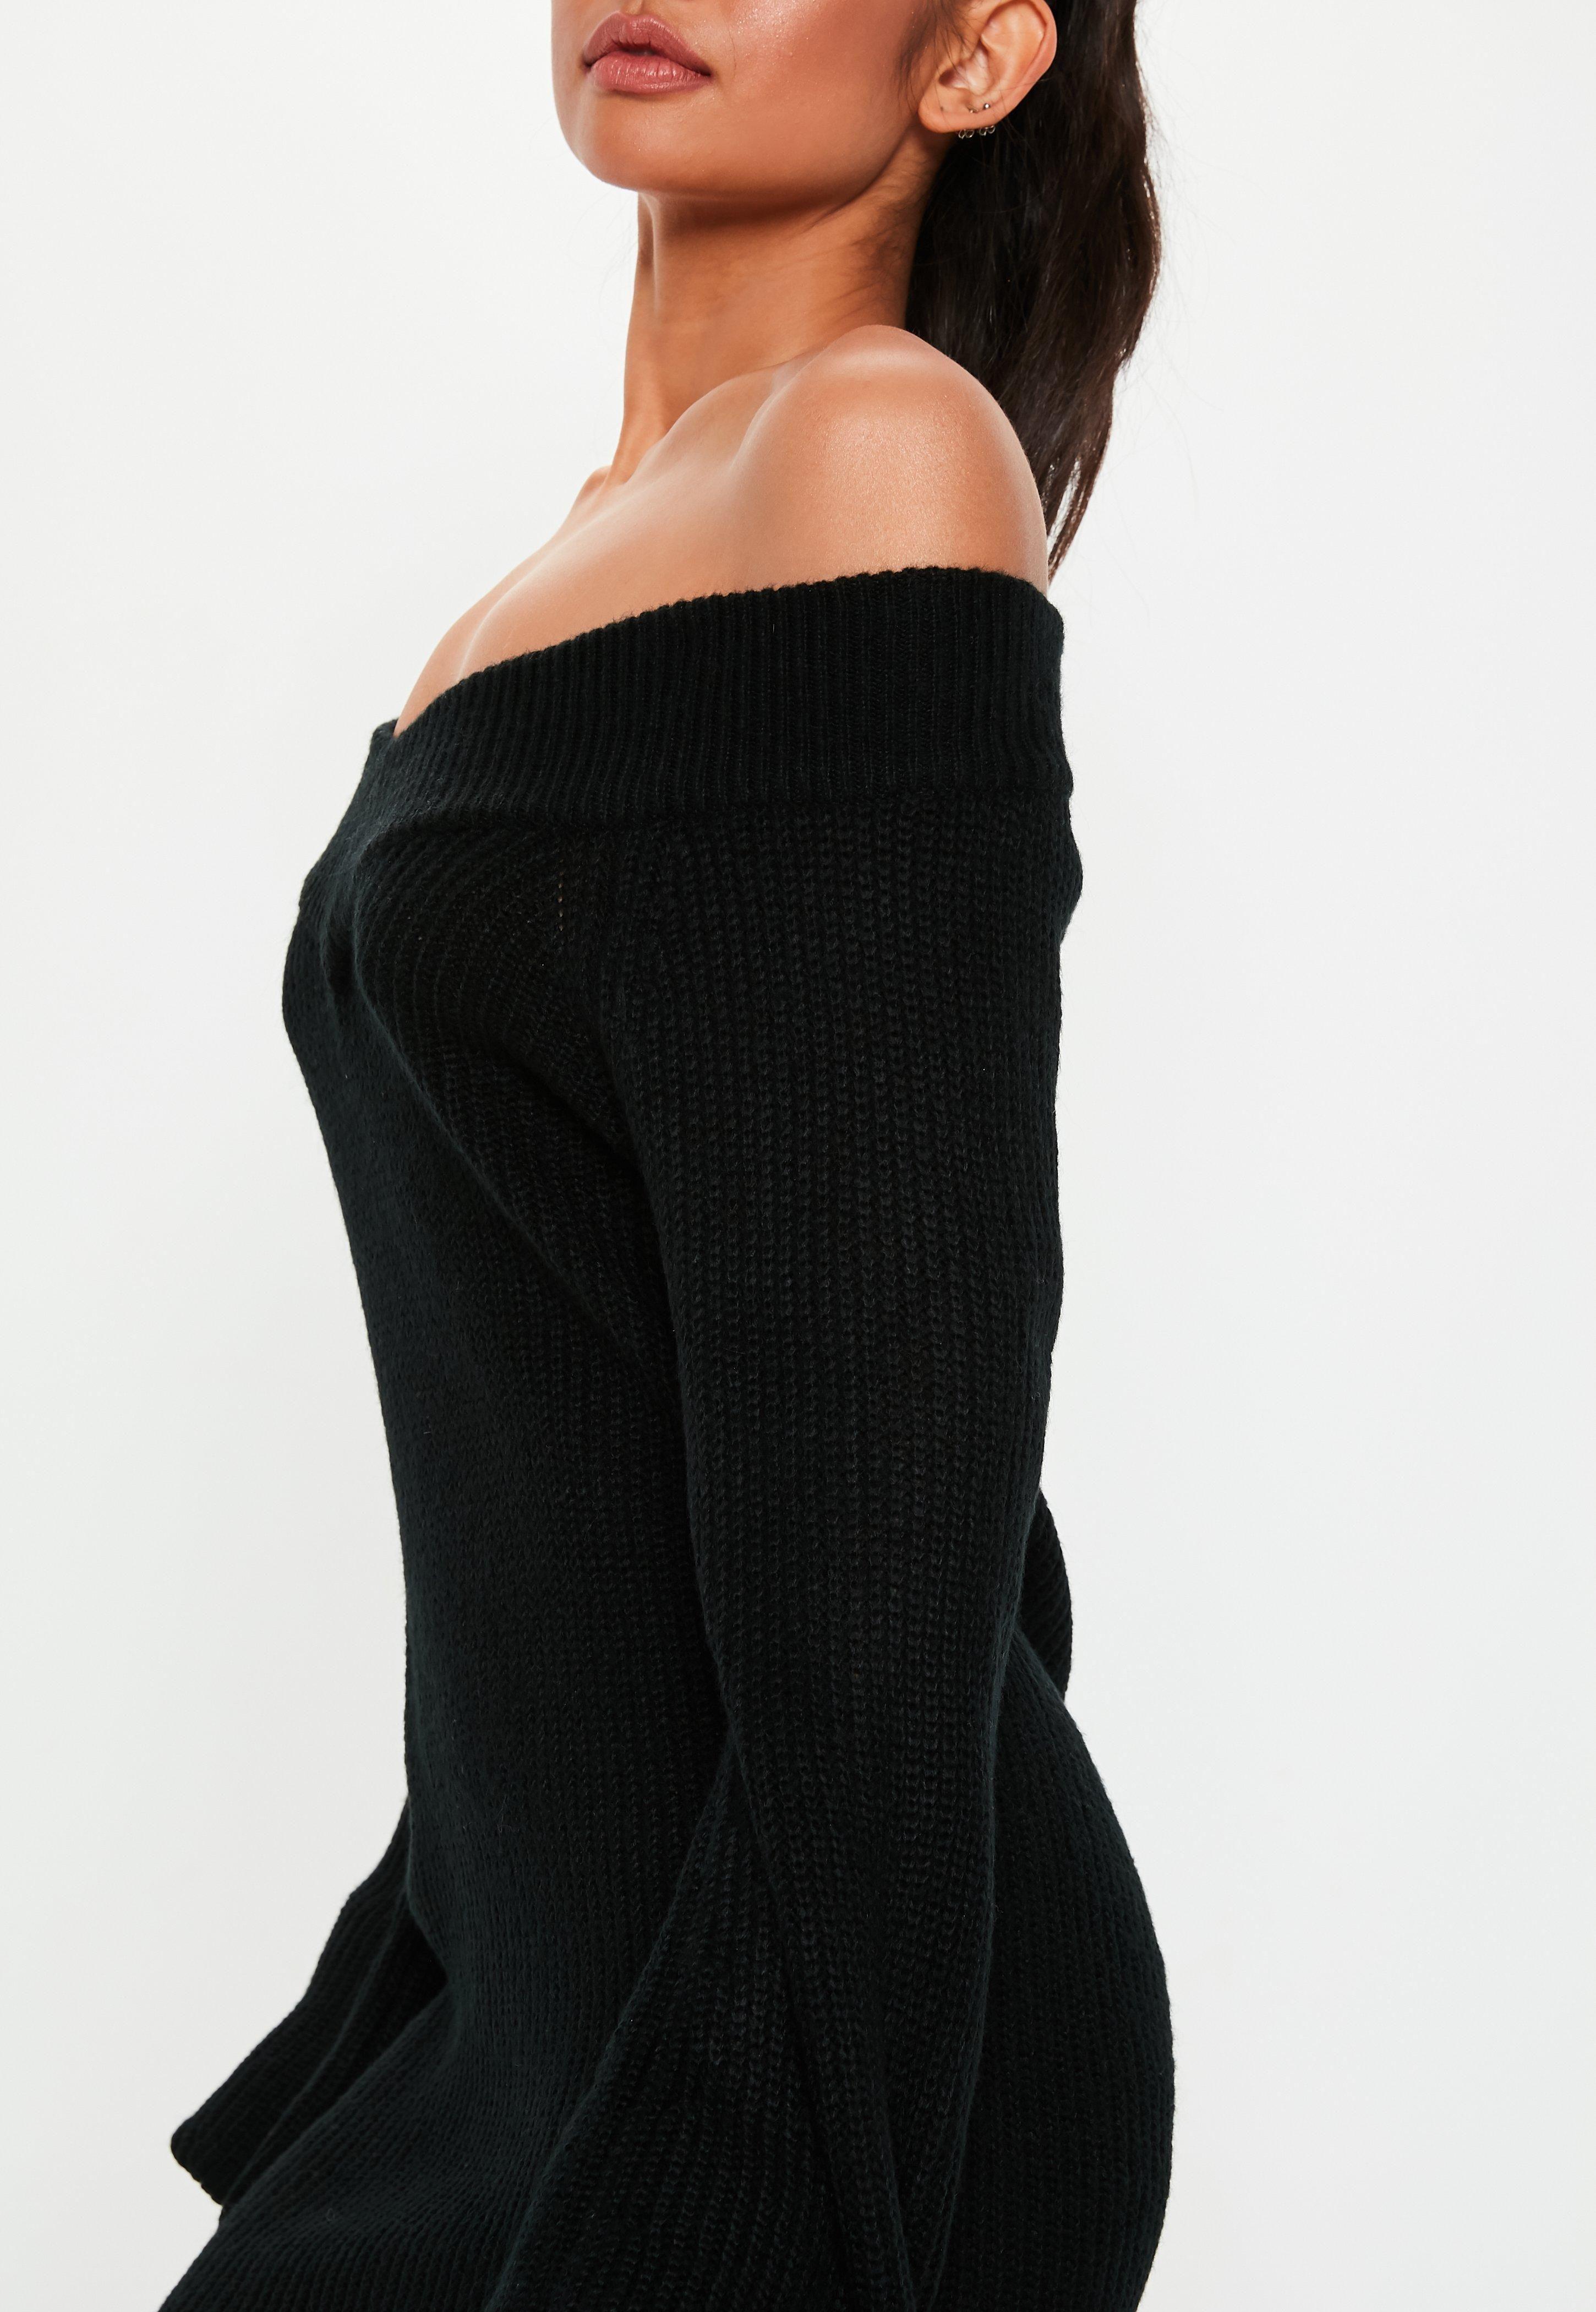 d44fca8bd78 Petite Black V Neck Sweater Dress  Sponsored  Black